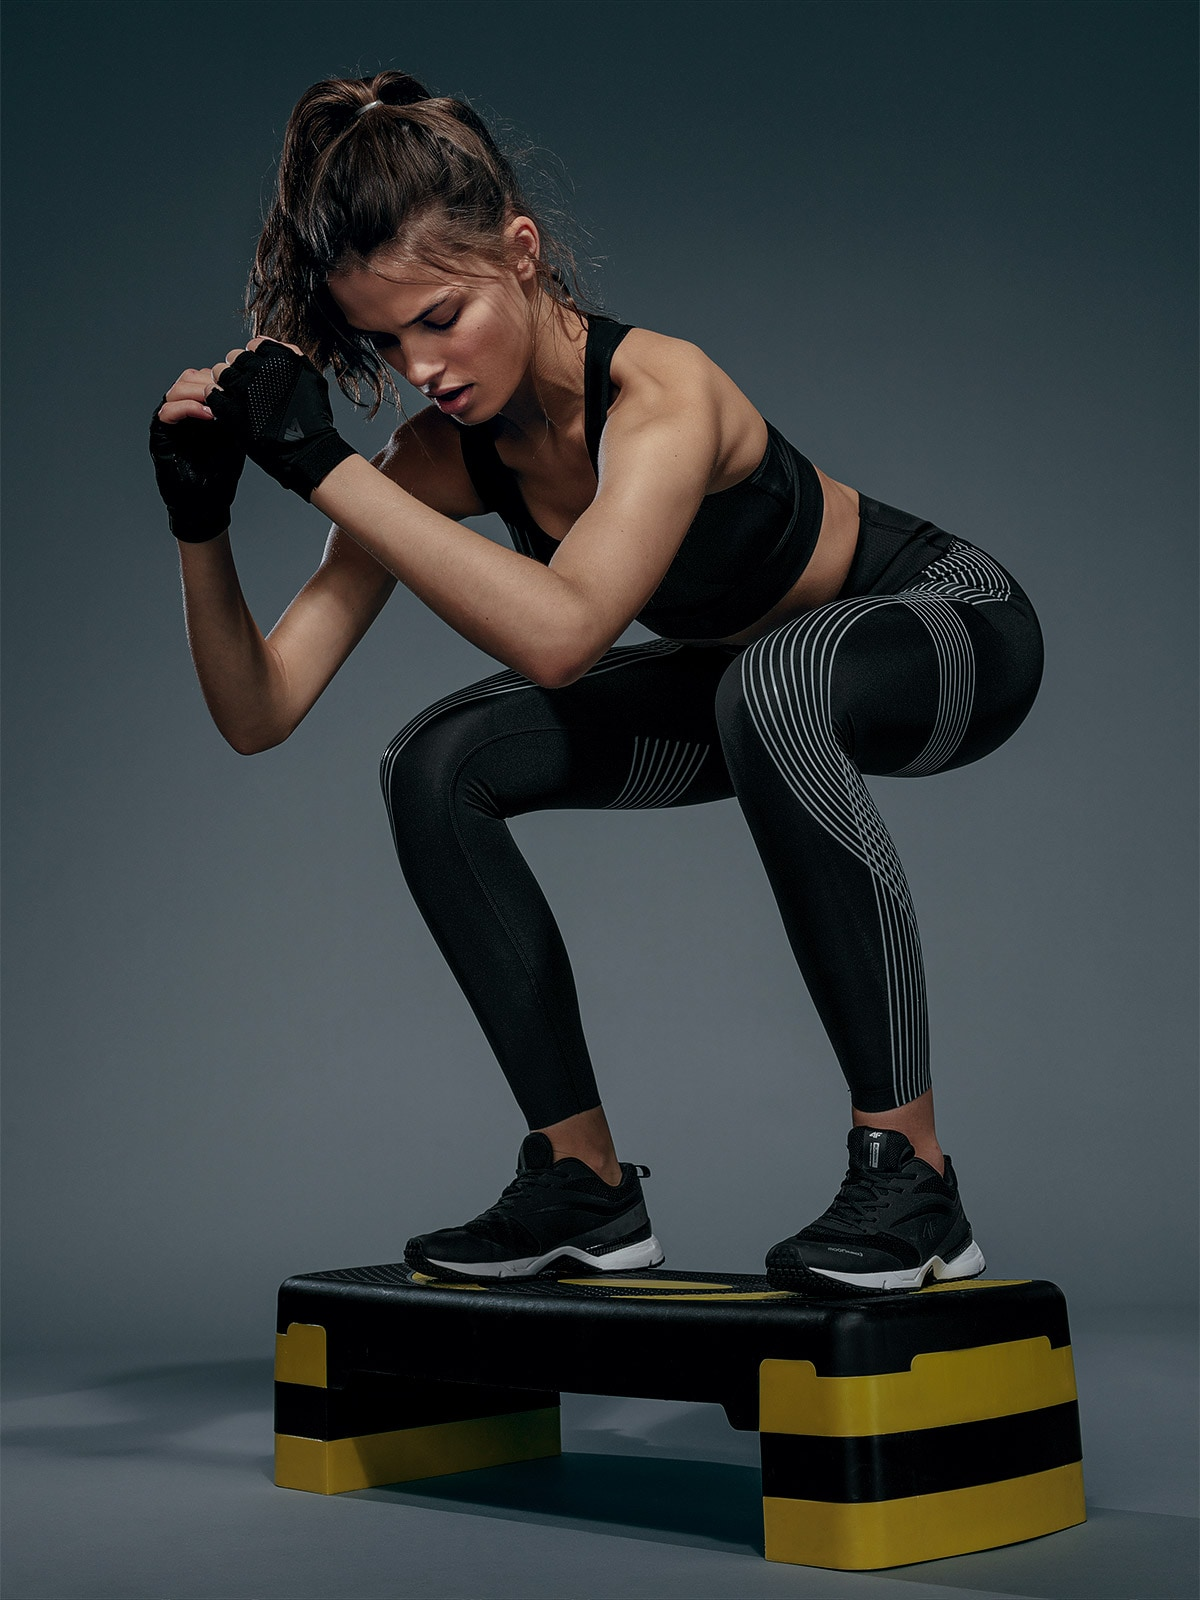 Legginsy treningowe damskie (athletic) 4FPro